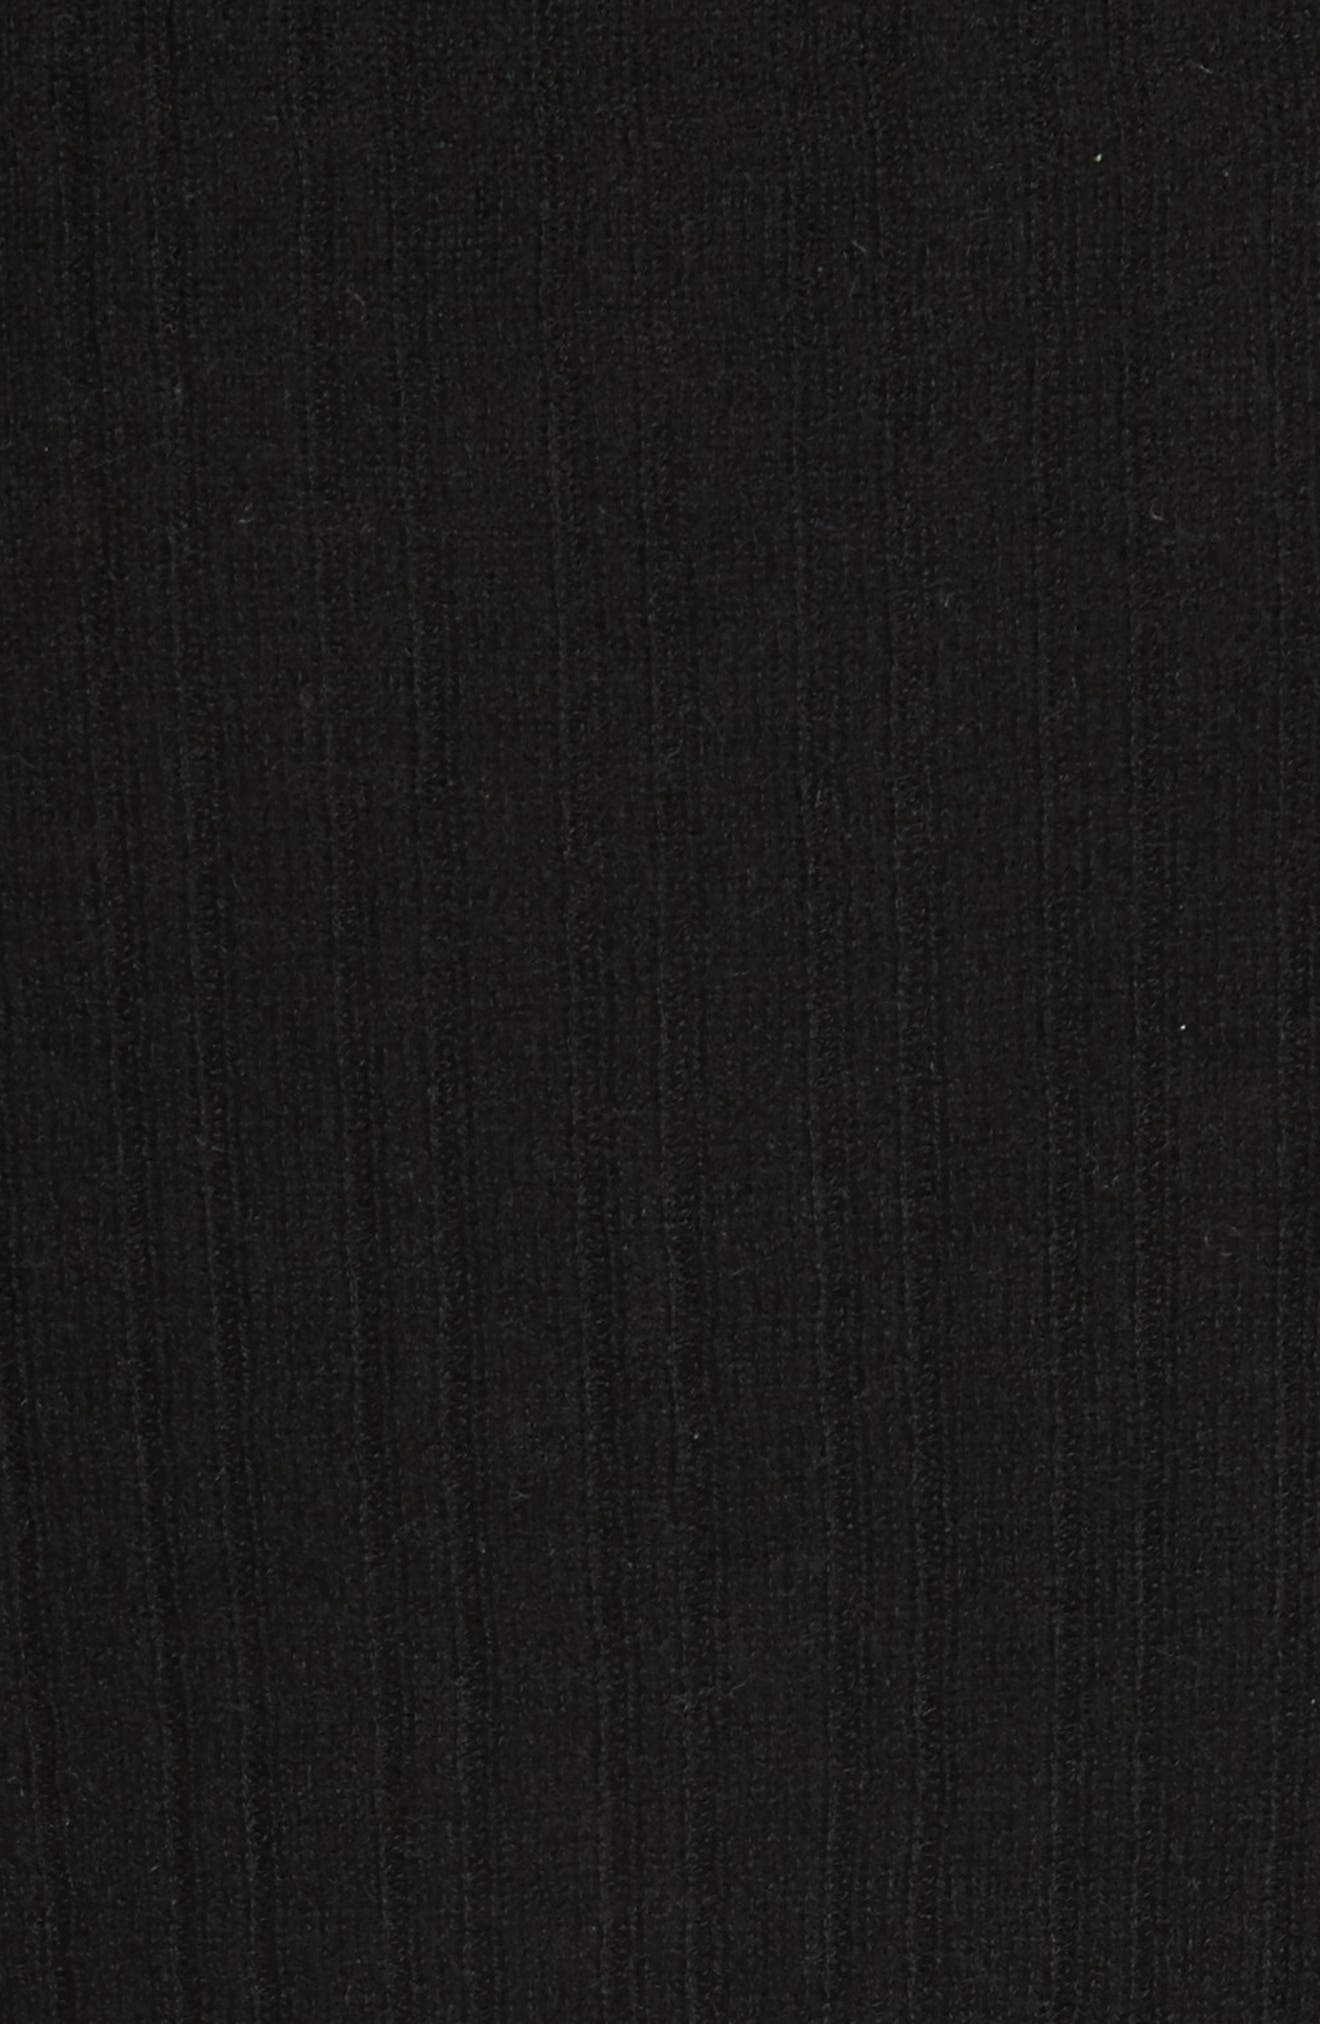 Ribbed Cashmere V-Neck Sweater,                             Alternate thumbnail 5, color,                             001